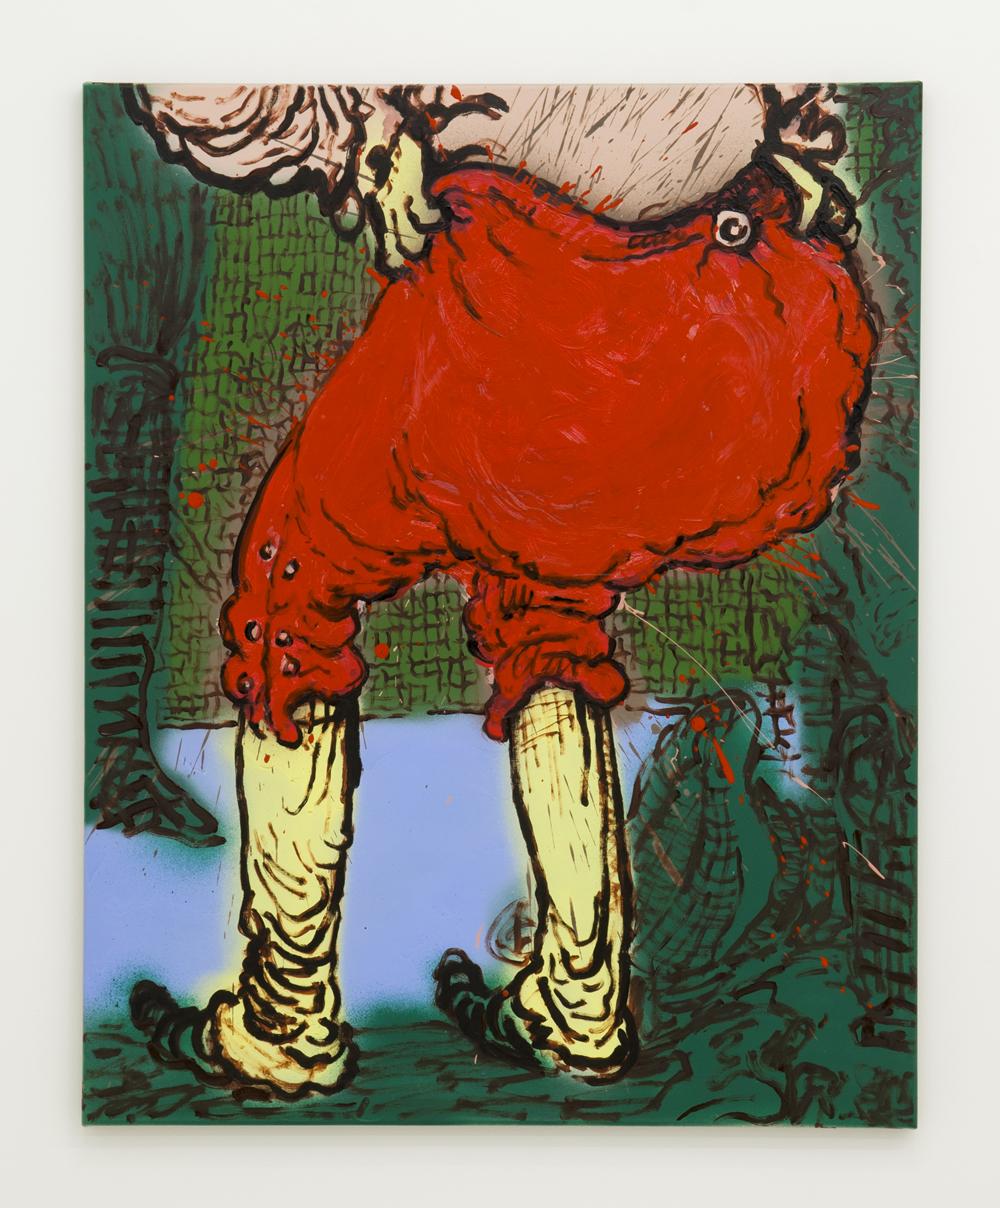 Charlie Billingham, Bum 14 ,2014,Oil and acrylic on linen,100 x 80cm